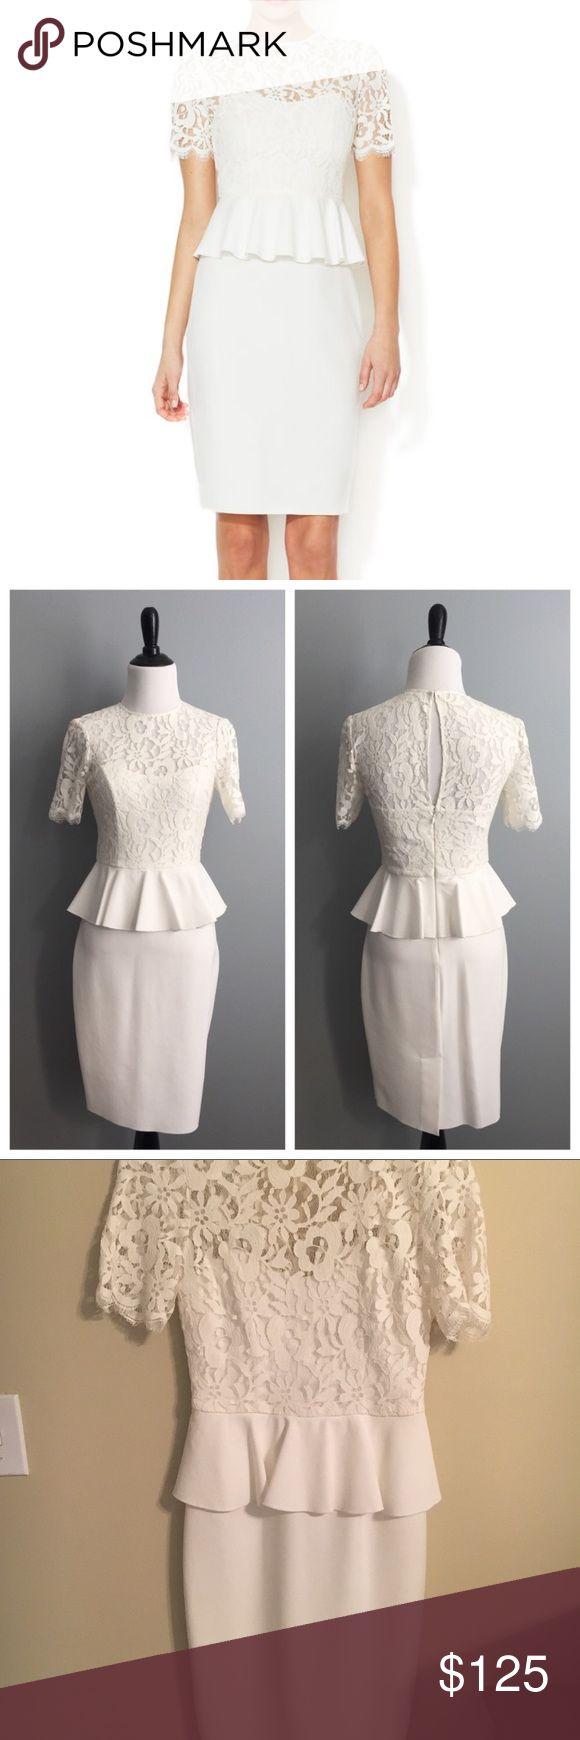 Jill Jill Stuart - white peplum dress; size 2 This gorgeous dress is perfect for a wedding shower or bachelorette party!  It's never been worn, tags still on. Jill Stuart Dresses Midi